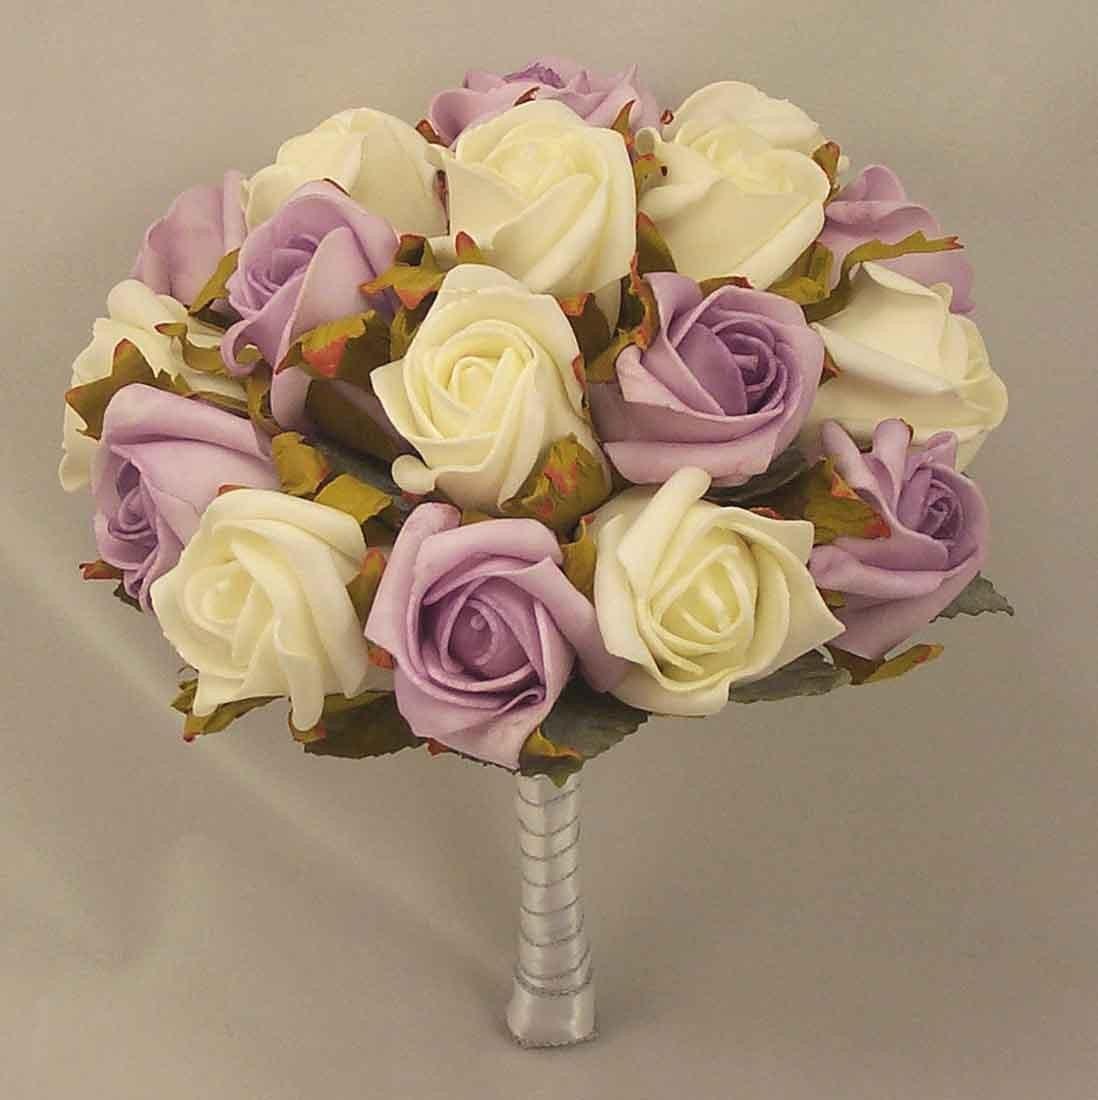 White & Lilac Rose Medium Table Posy